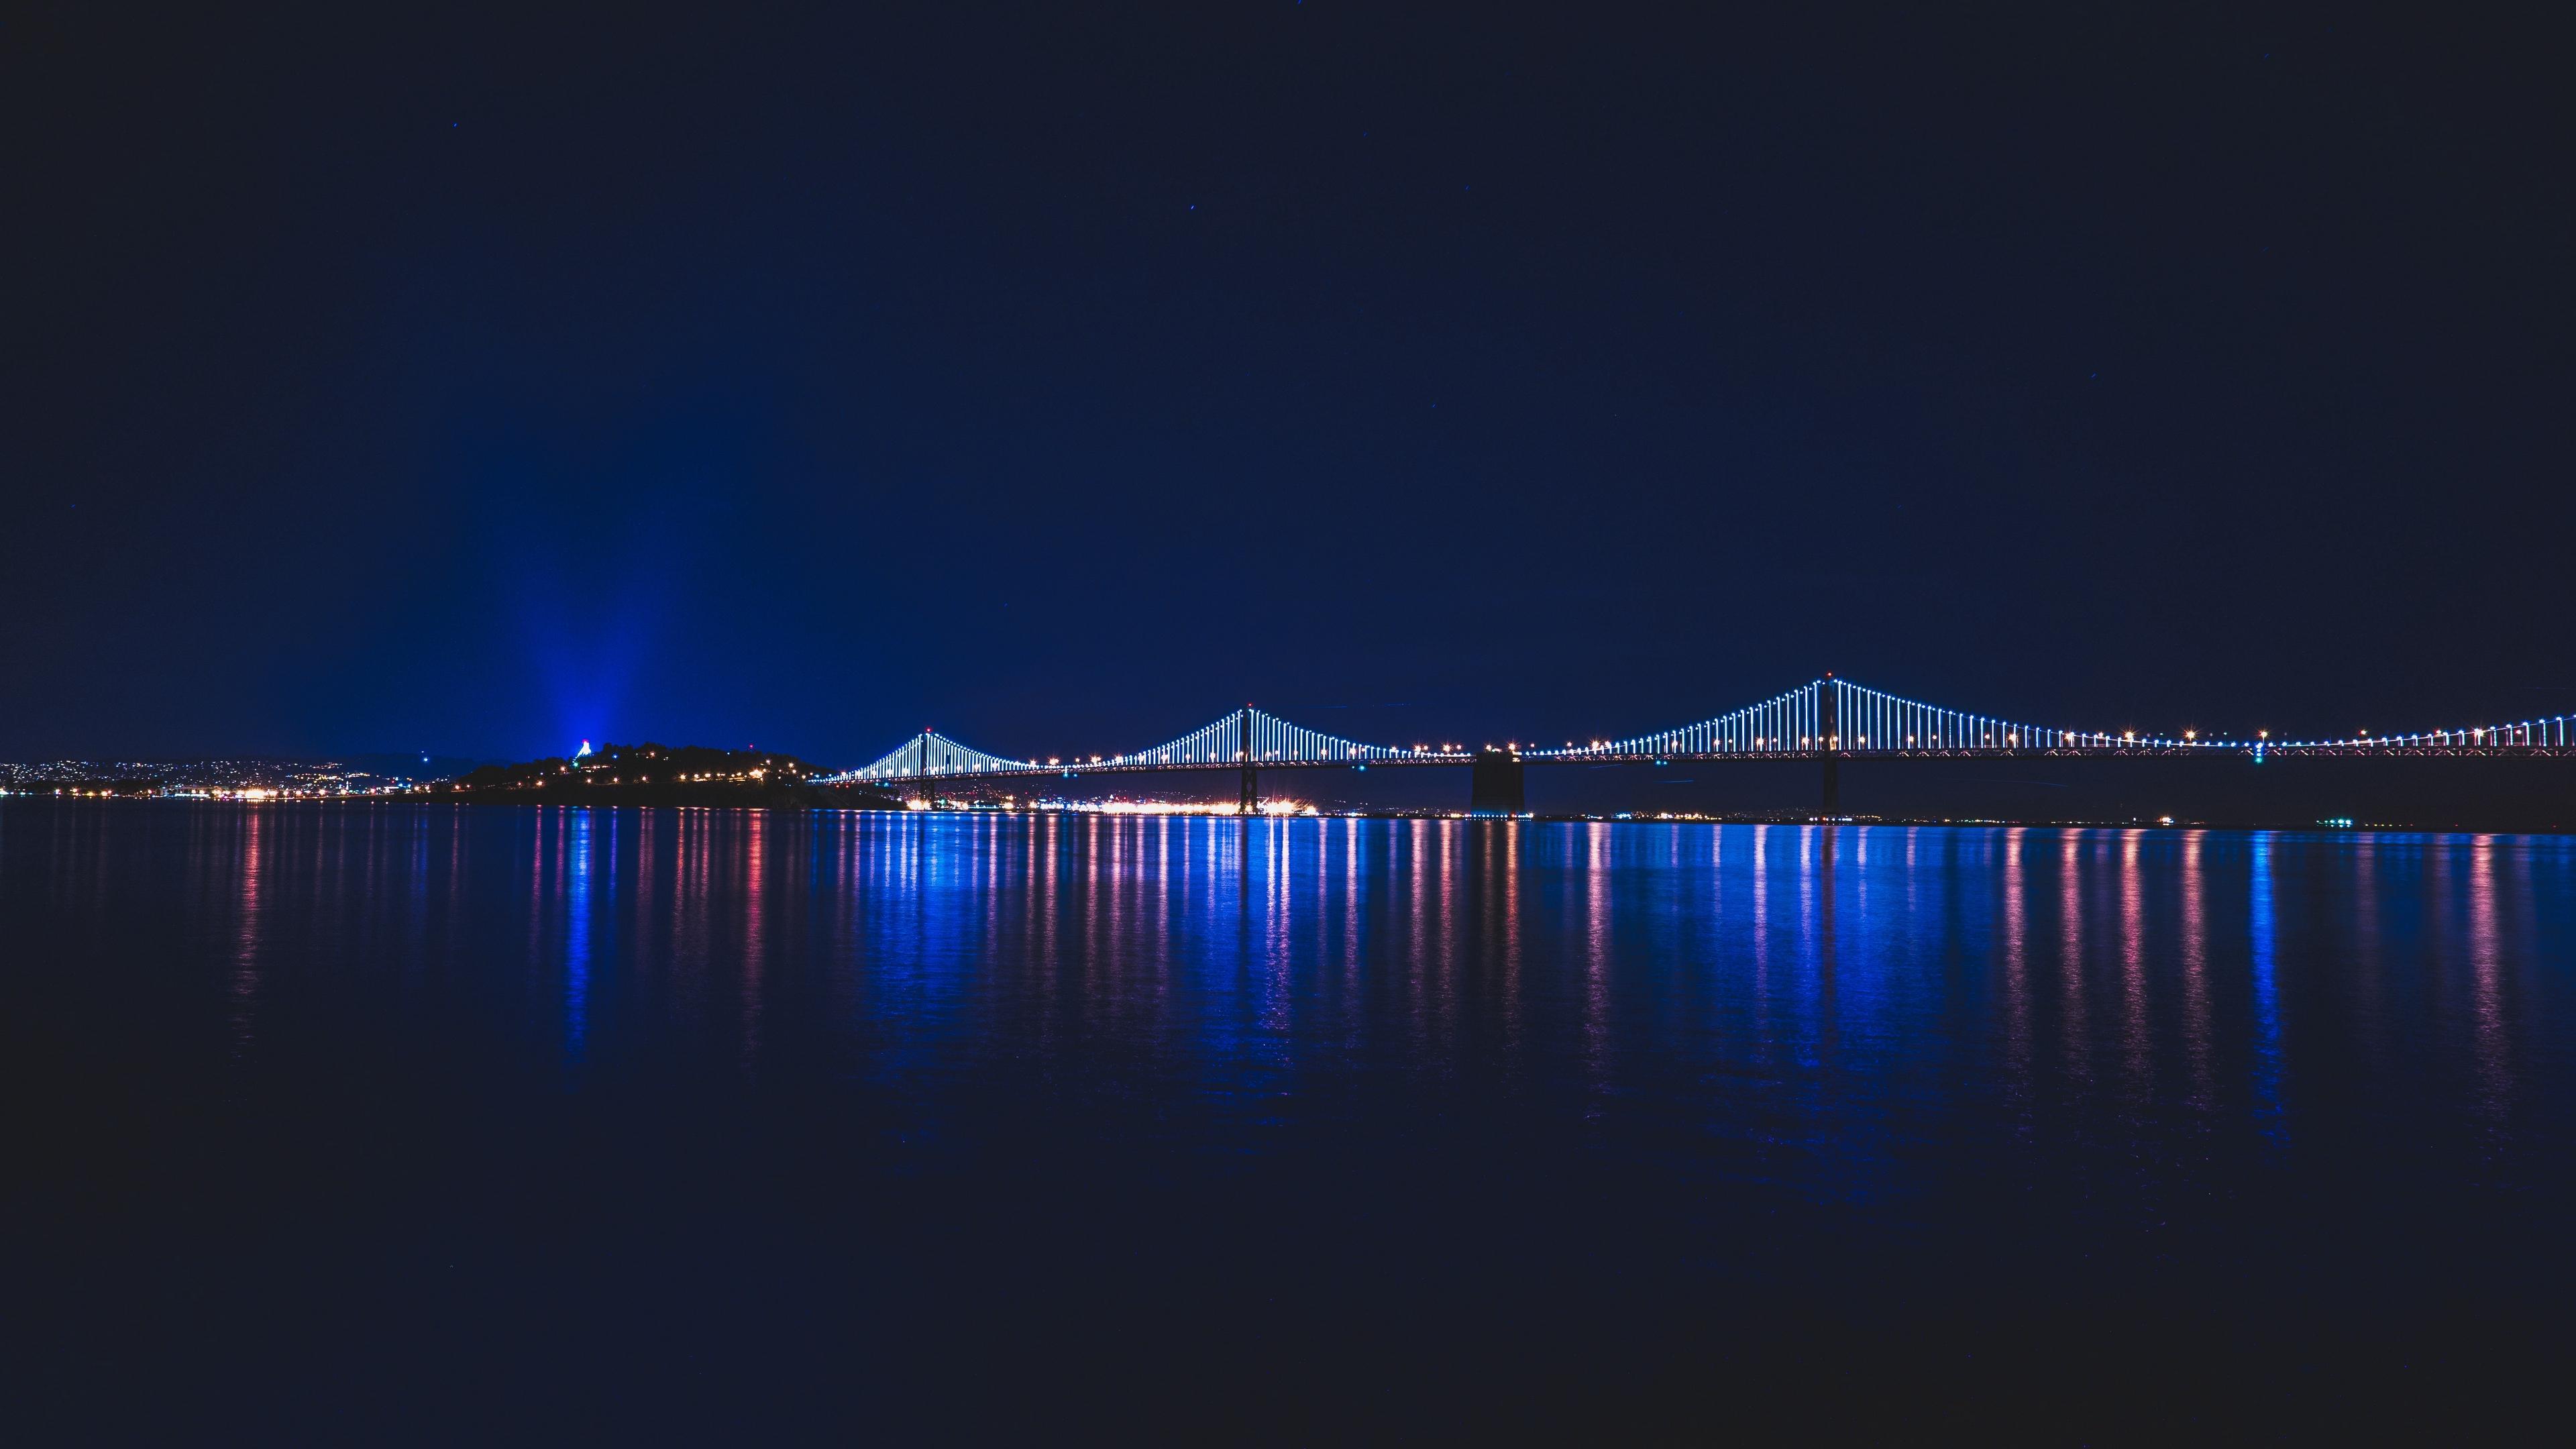 bridge night city river 4k 1538065480 - bridge, night, city, river 4k - Night, City, bridge